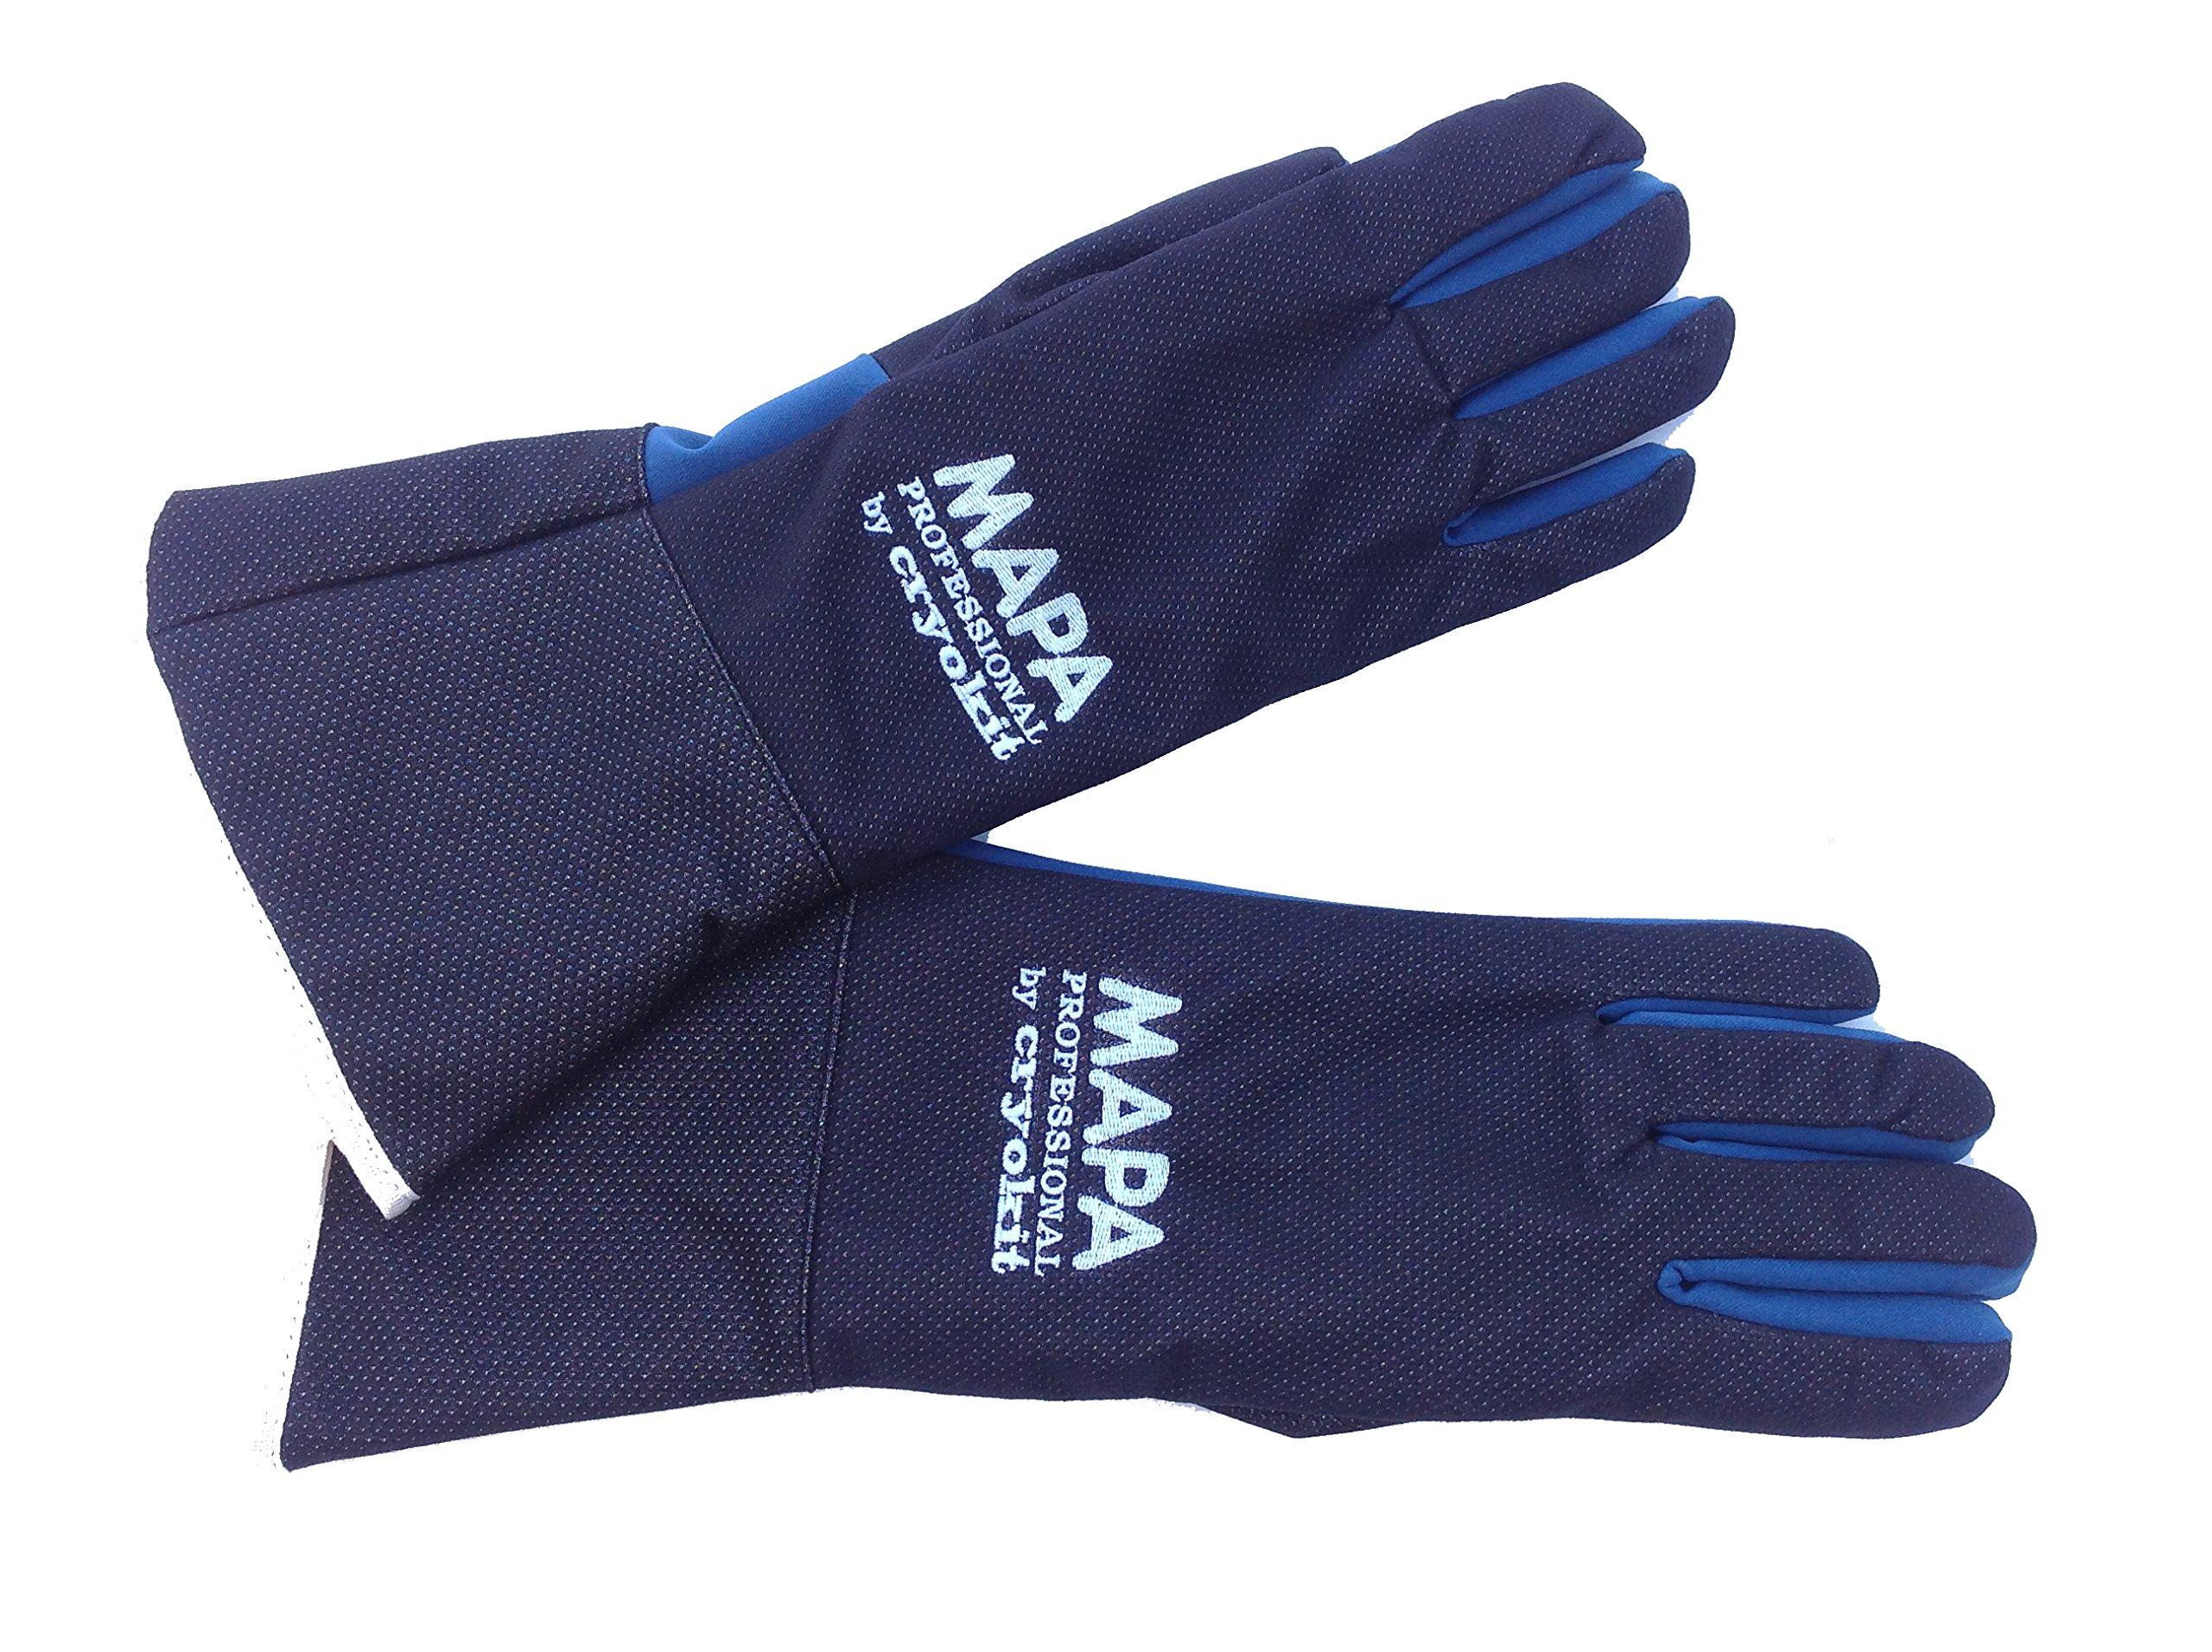 MAPA Professional CRYKIT400410 CRYOKIT400 Cryogenic Glove, (16''-Ma), Size 10, PR 1, Blue